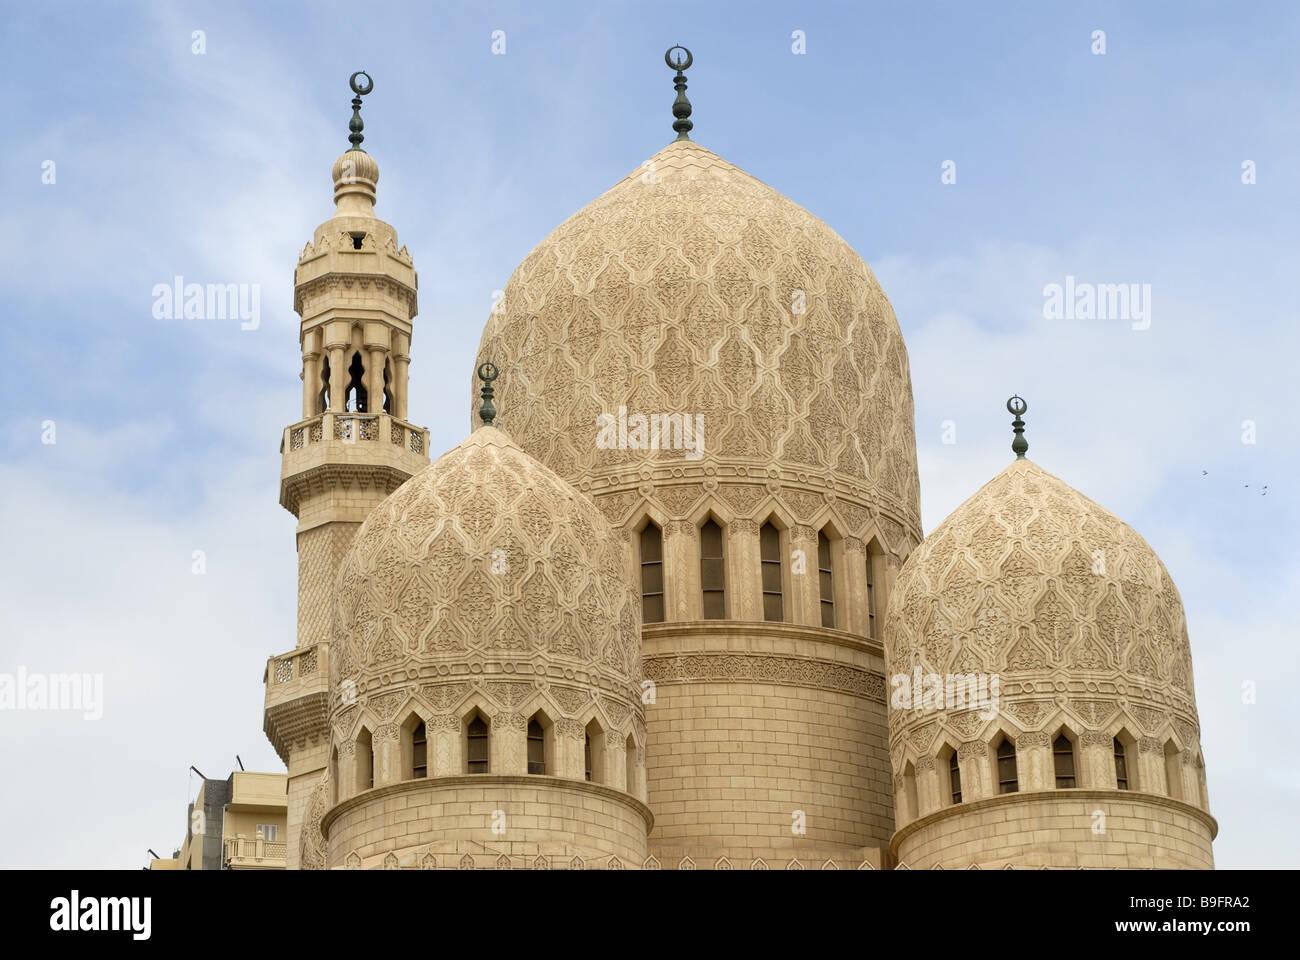 What Is A Mosque Detail: Egypt Alexandria Abu-el-Abbas-el-Mursi-mosque Detail Domes